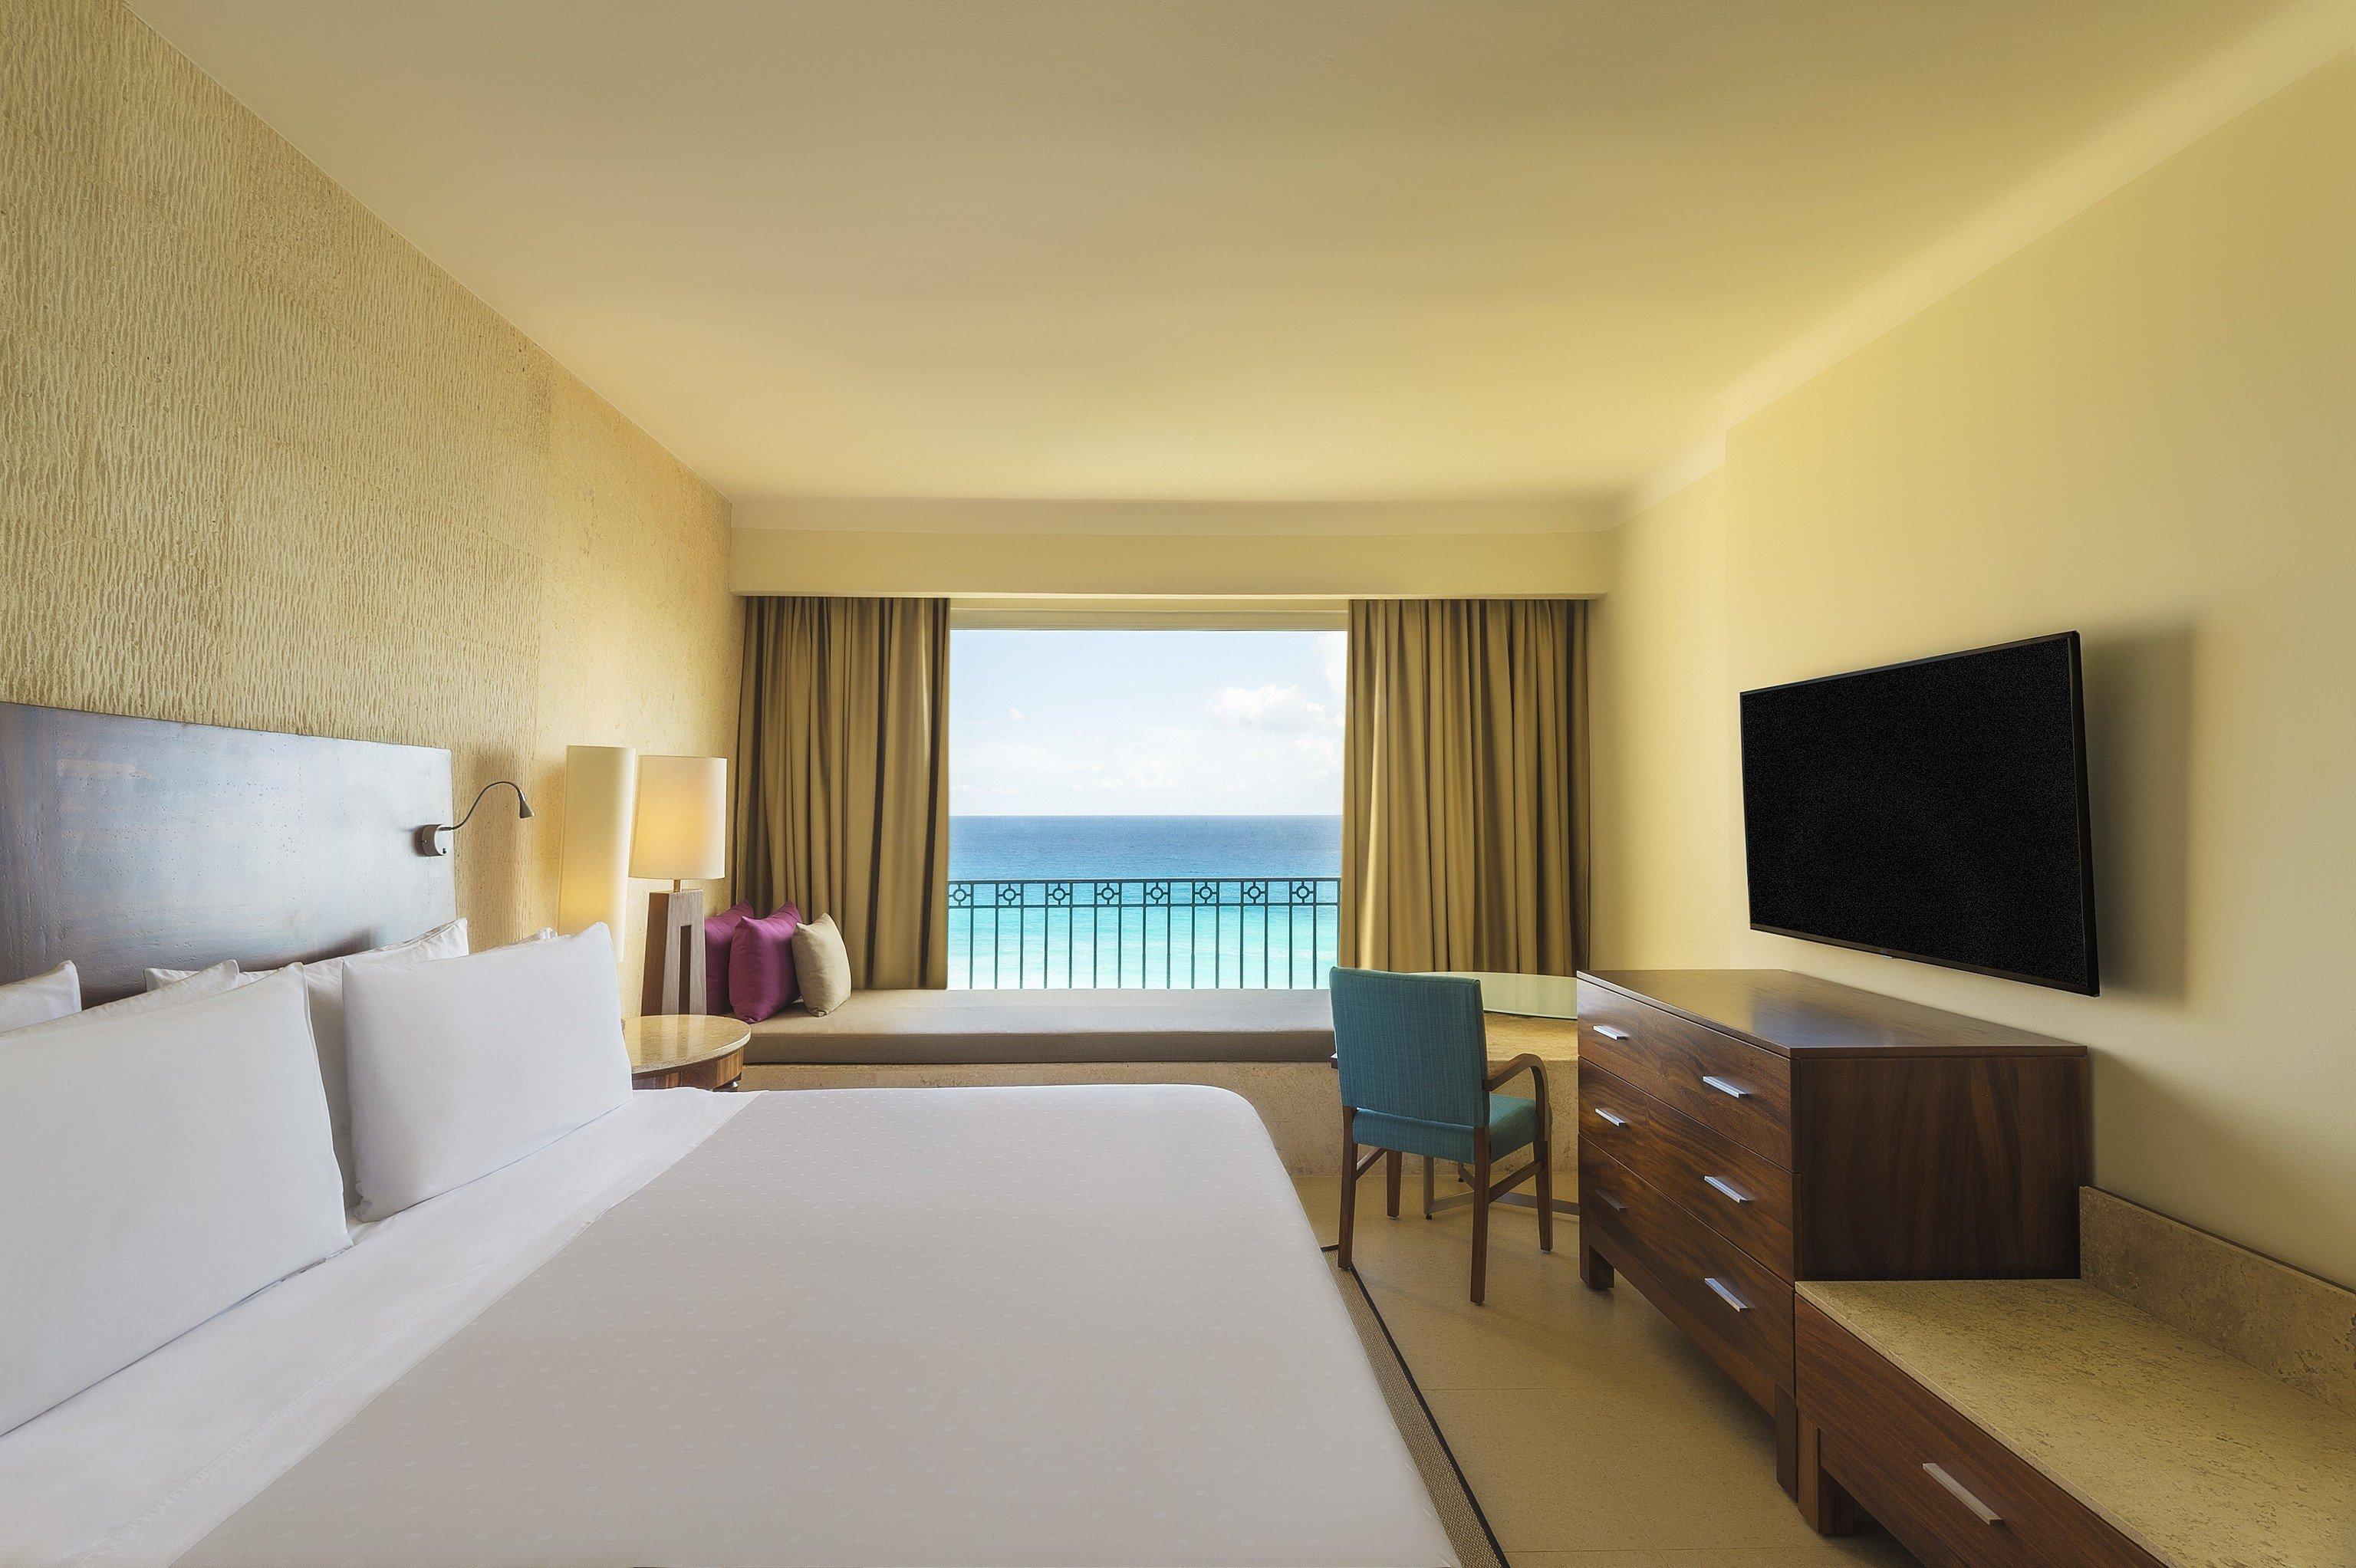 Suite interior designer Bedroom